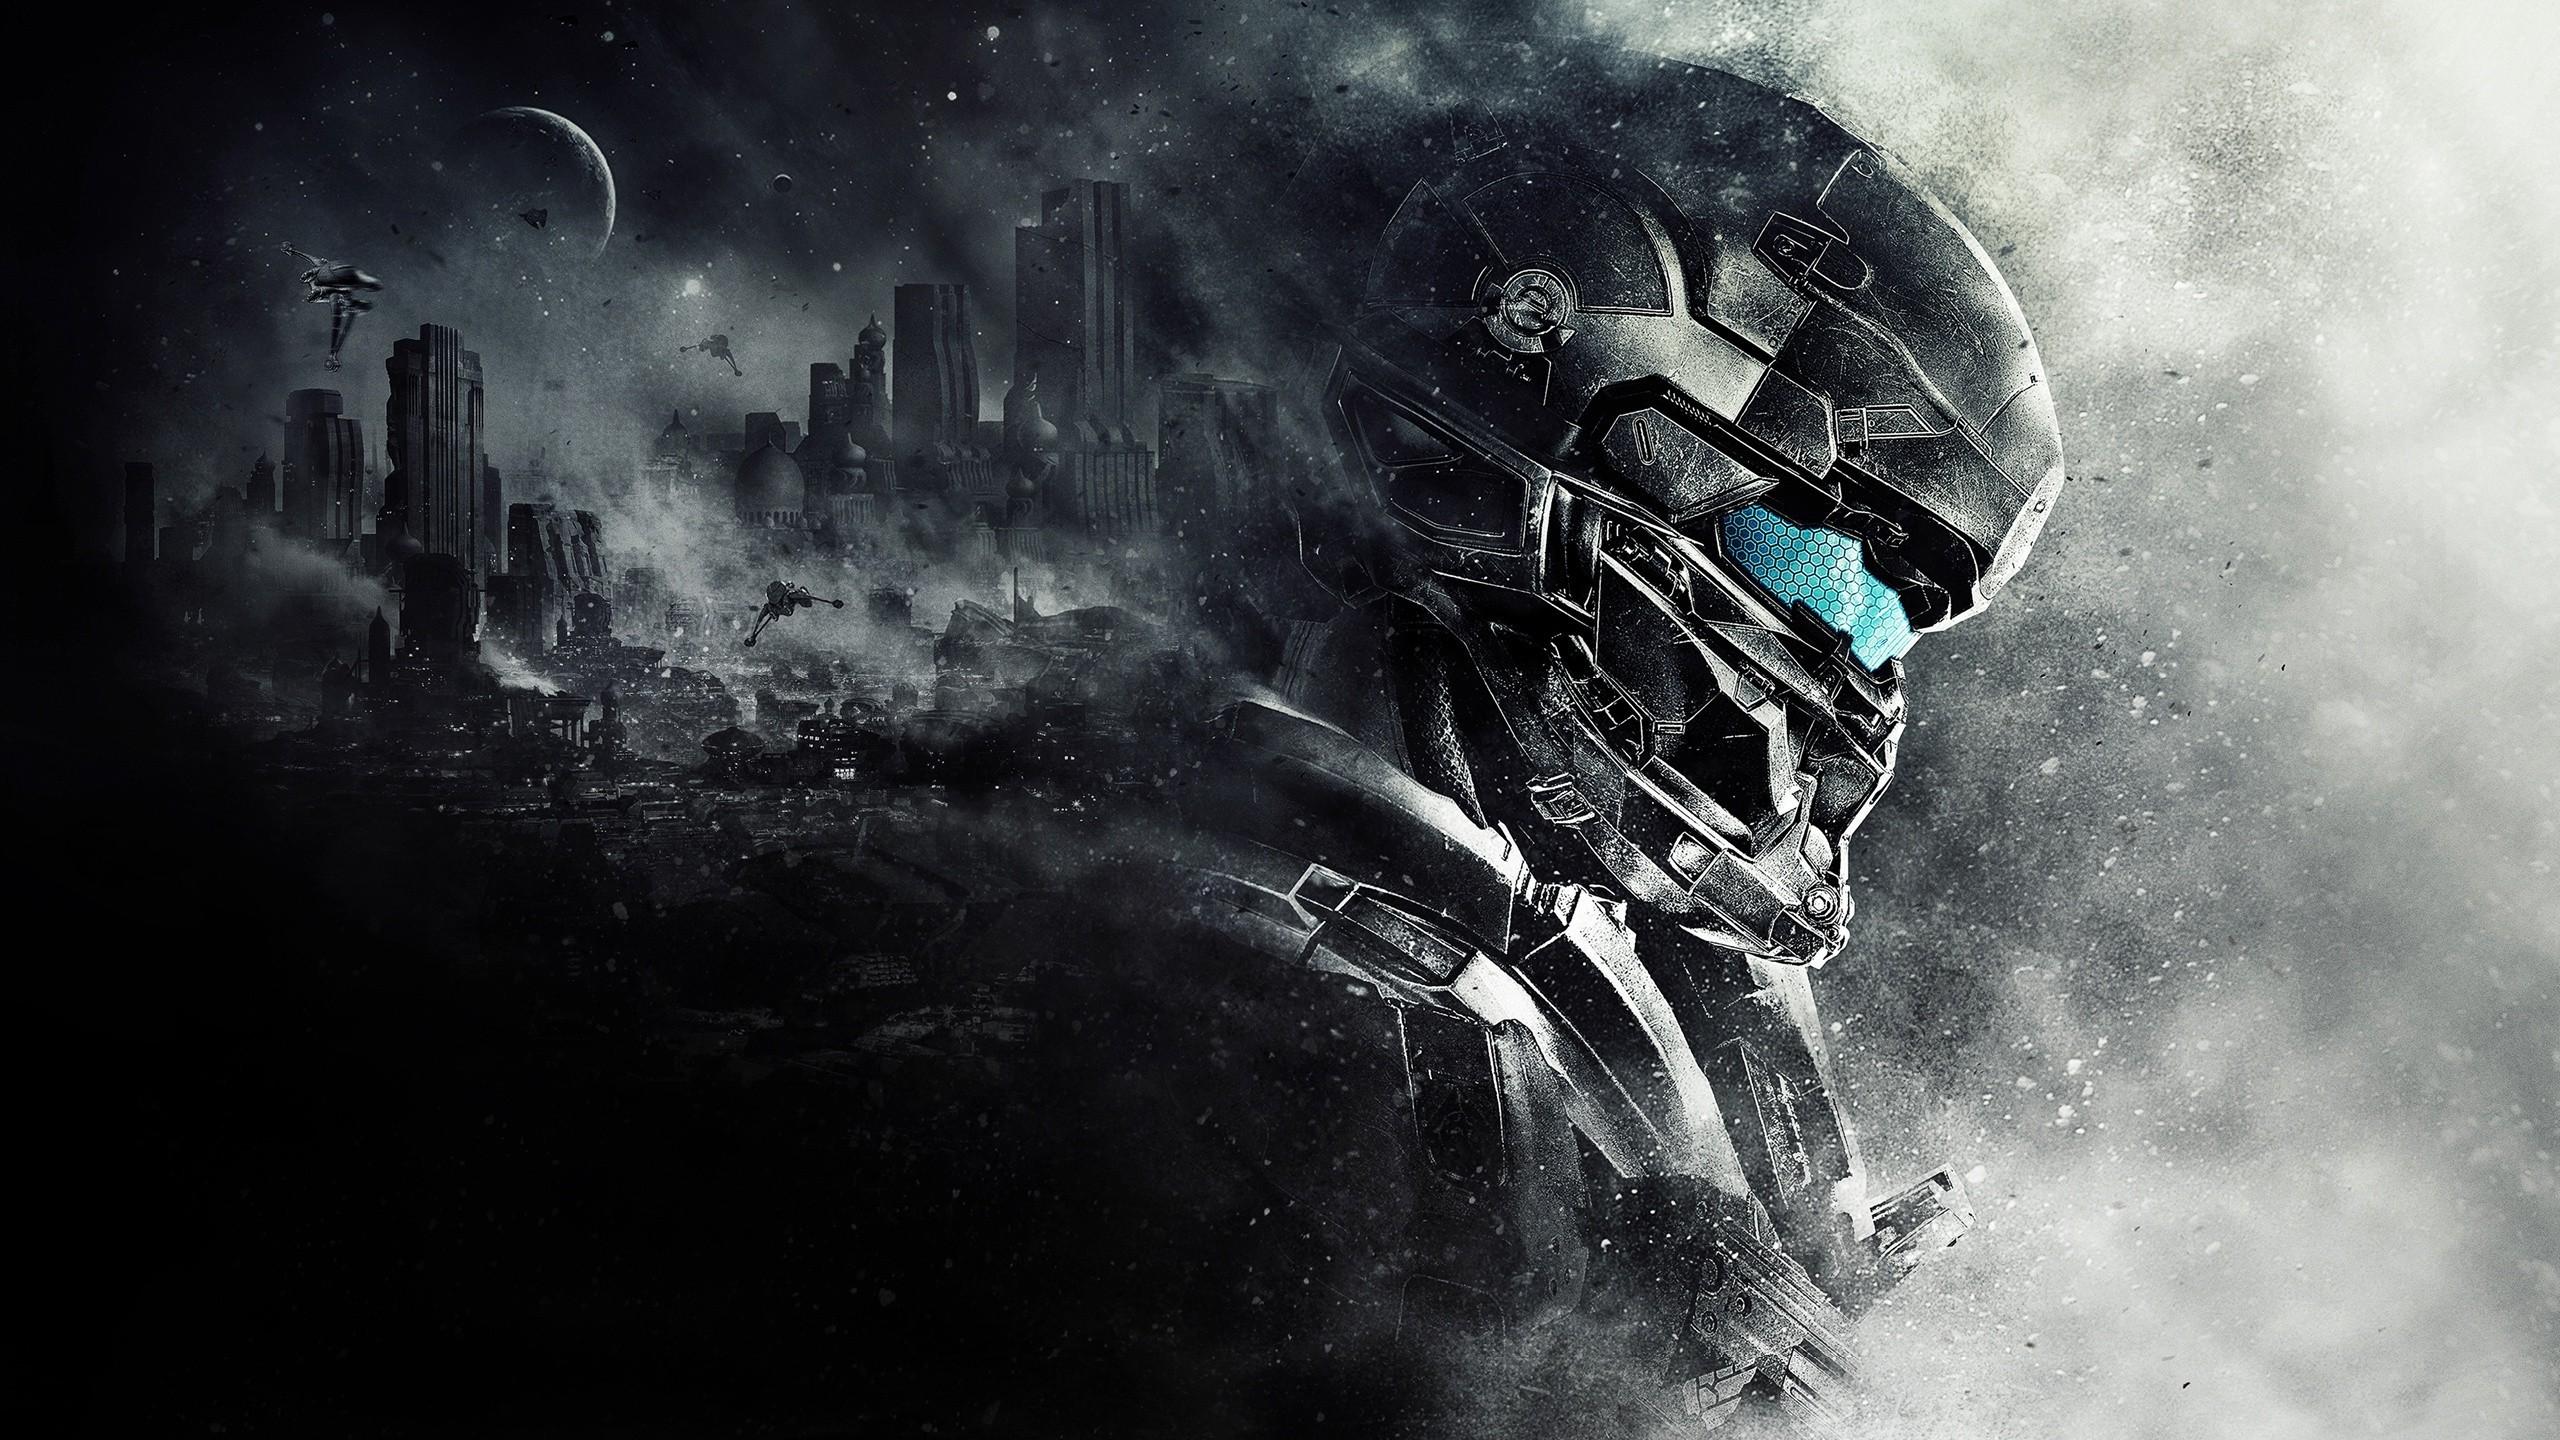 Halo 5 343 Spartan Locke